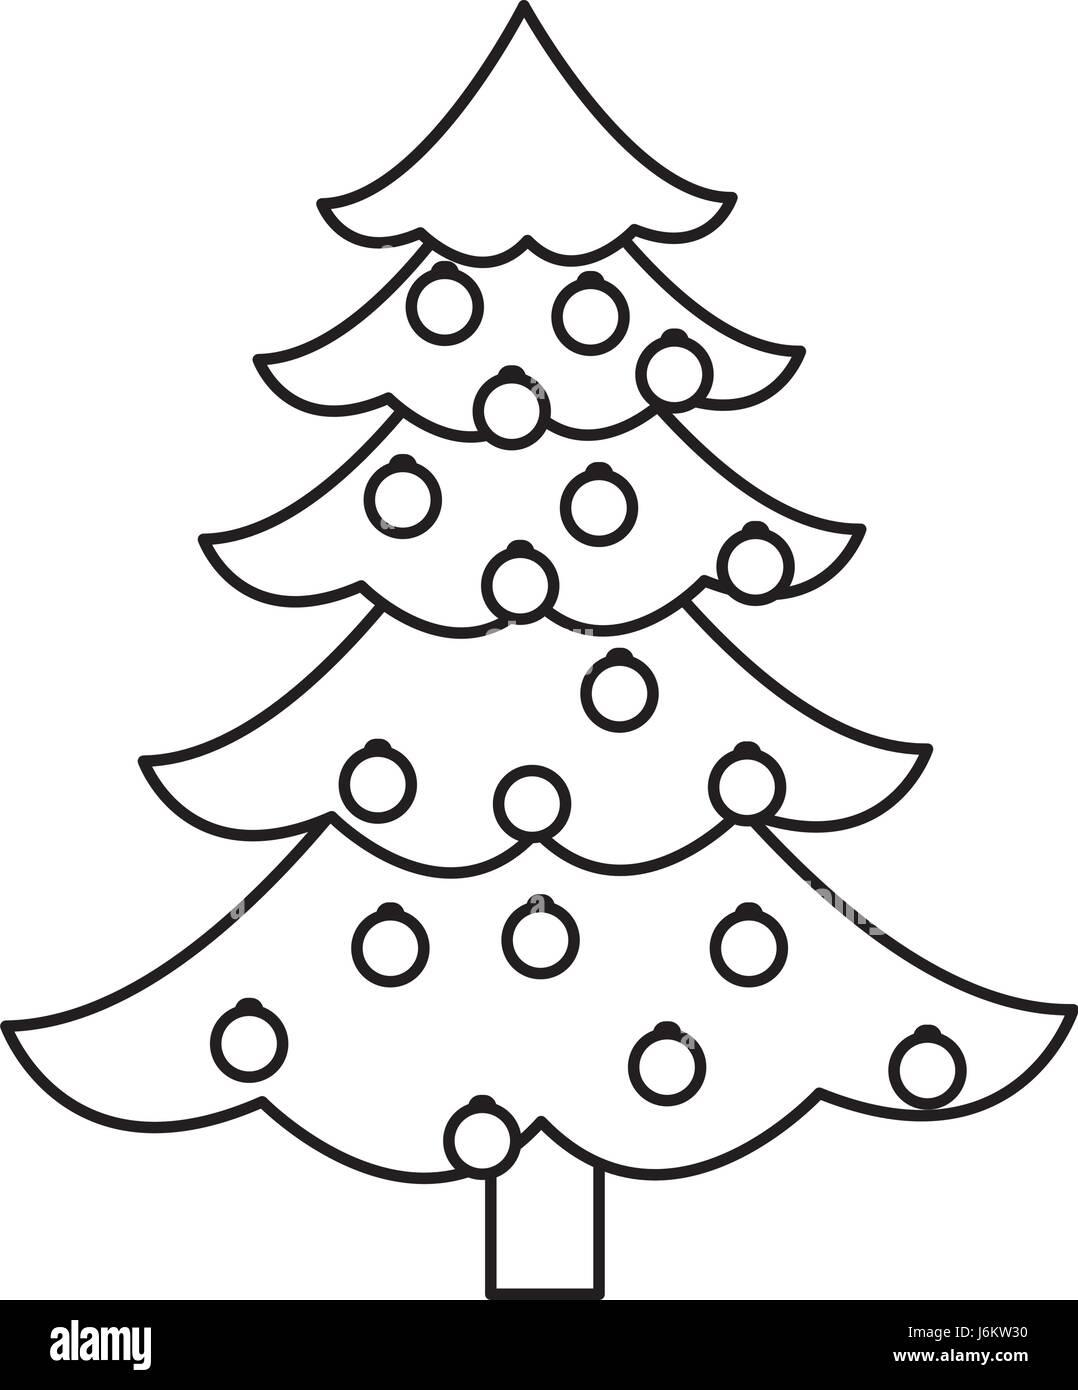 Outline Christmas Tree Stock Photos Outline Christmas Tree Stock